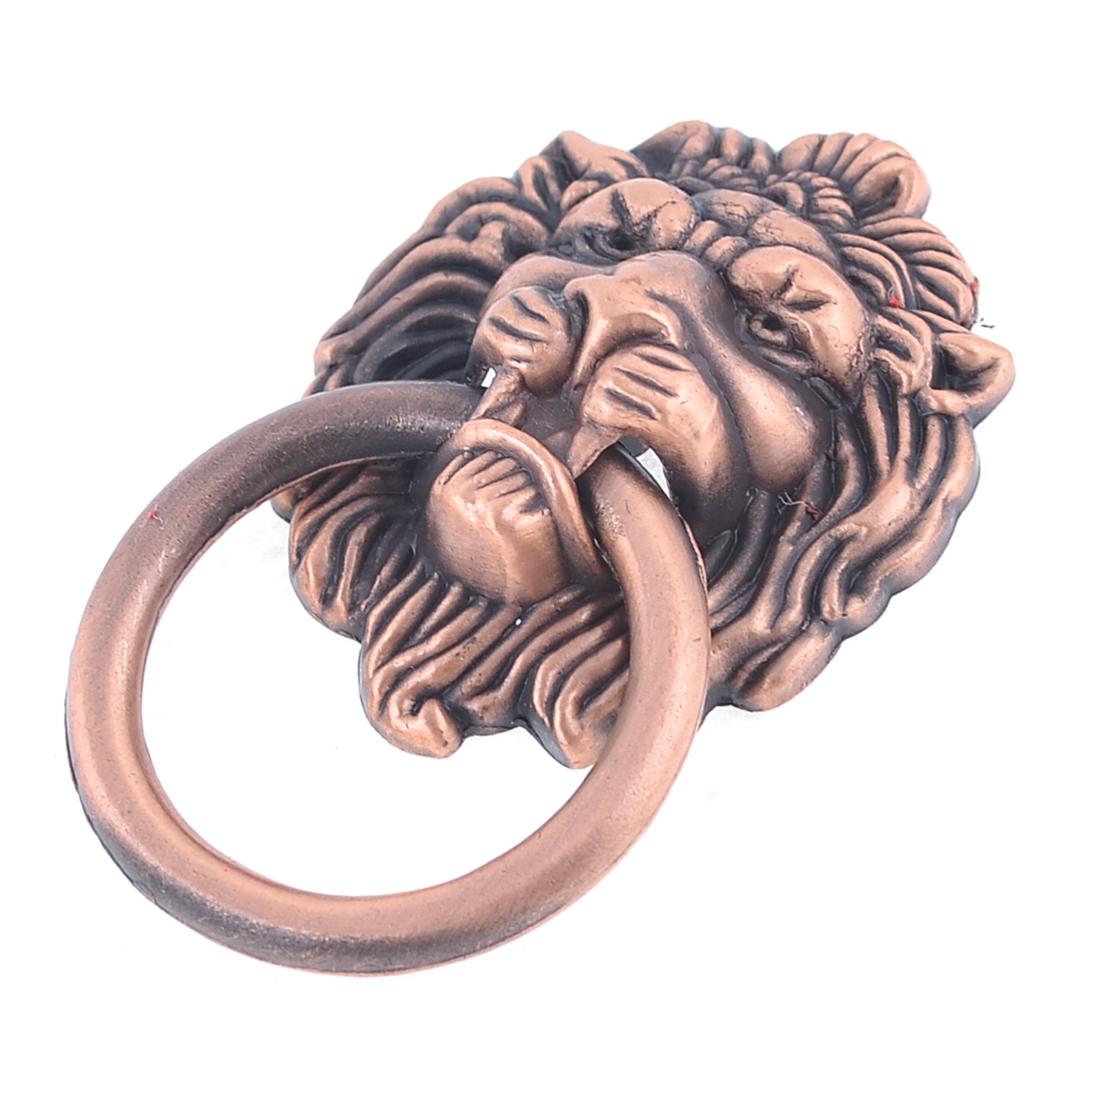 Lion Shaped 3.7cm Ring Diameter Copper Tone Metallic Room House Door Pull Knob